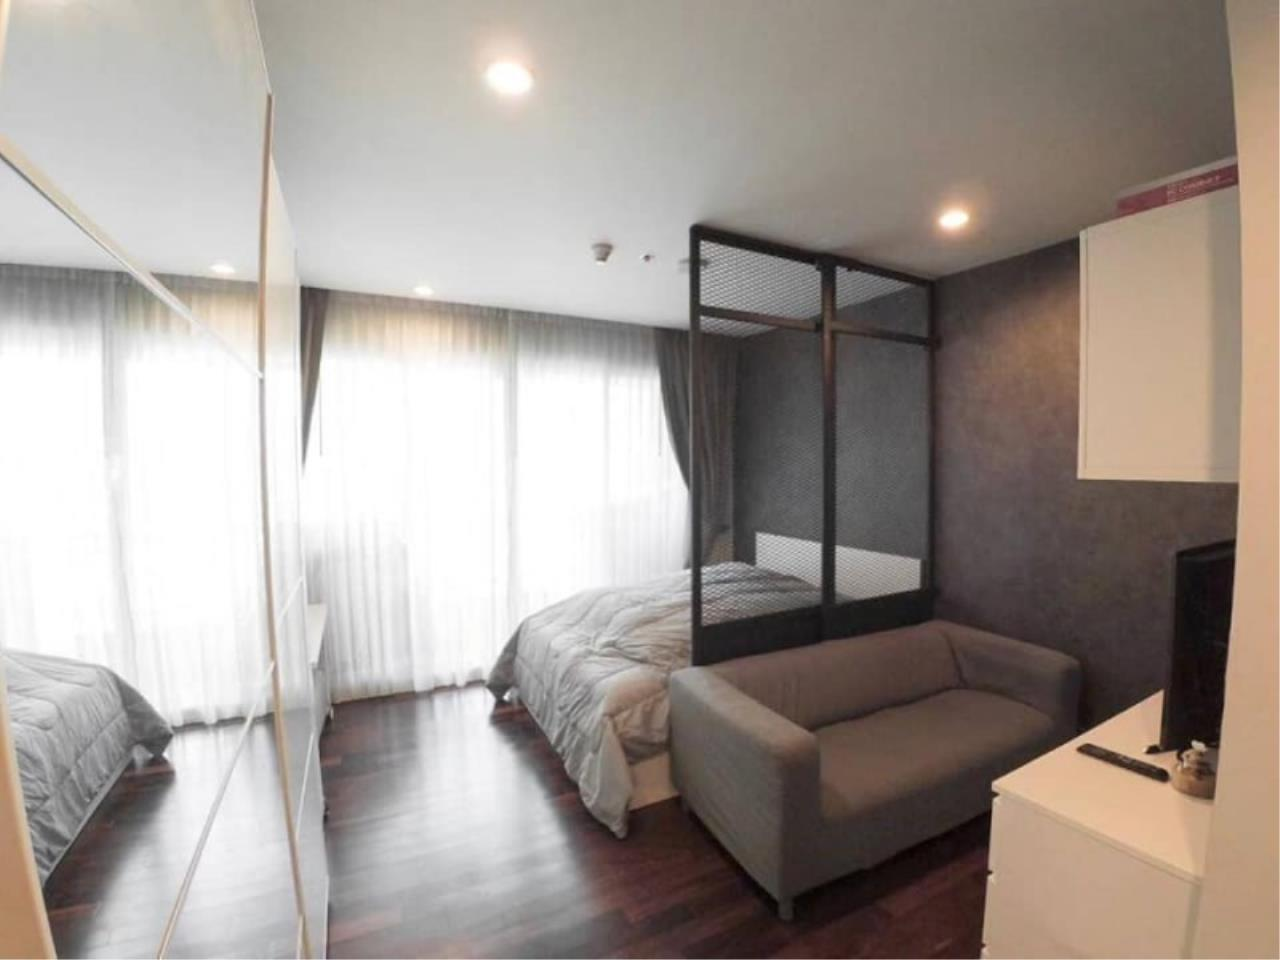 Century21 Skylux Agency's Circle Condominium / Condo For Sale / 1 Bedroom / 33.51 SQM / MRT Phetchaburi / Bangkok 2